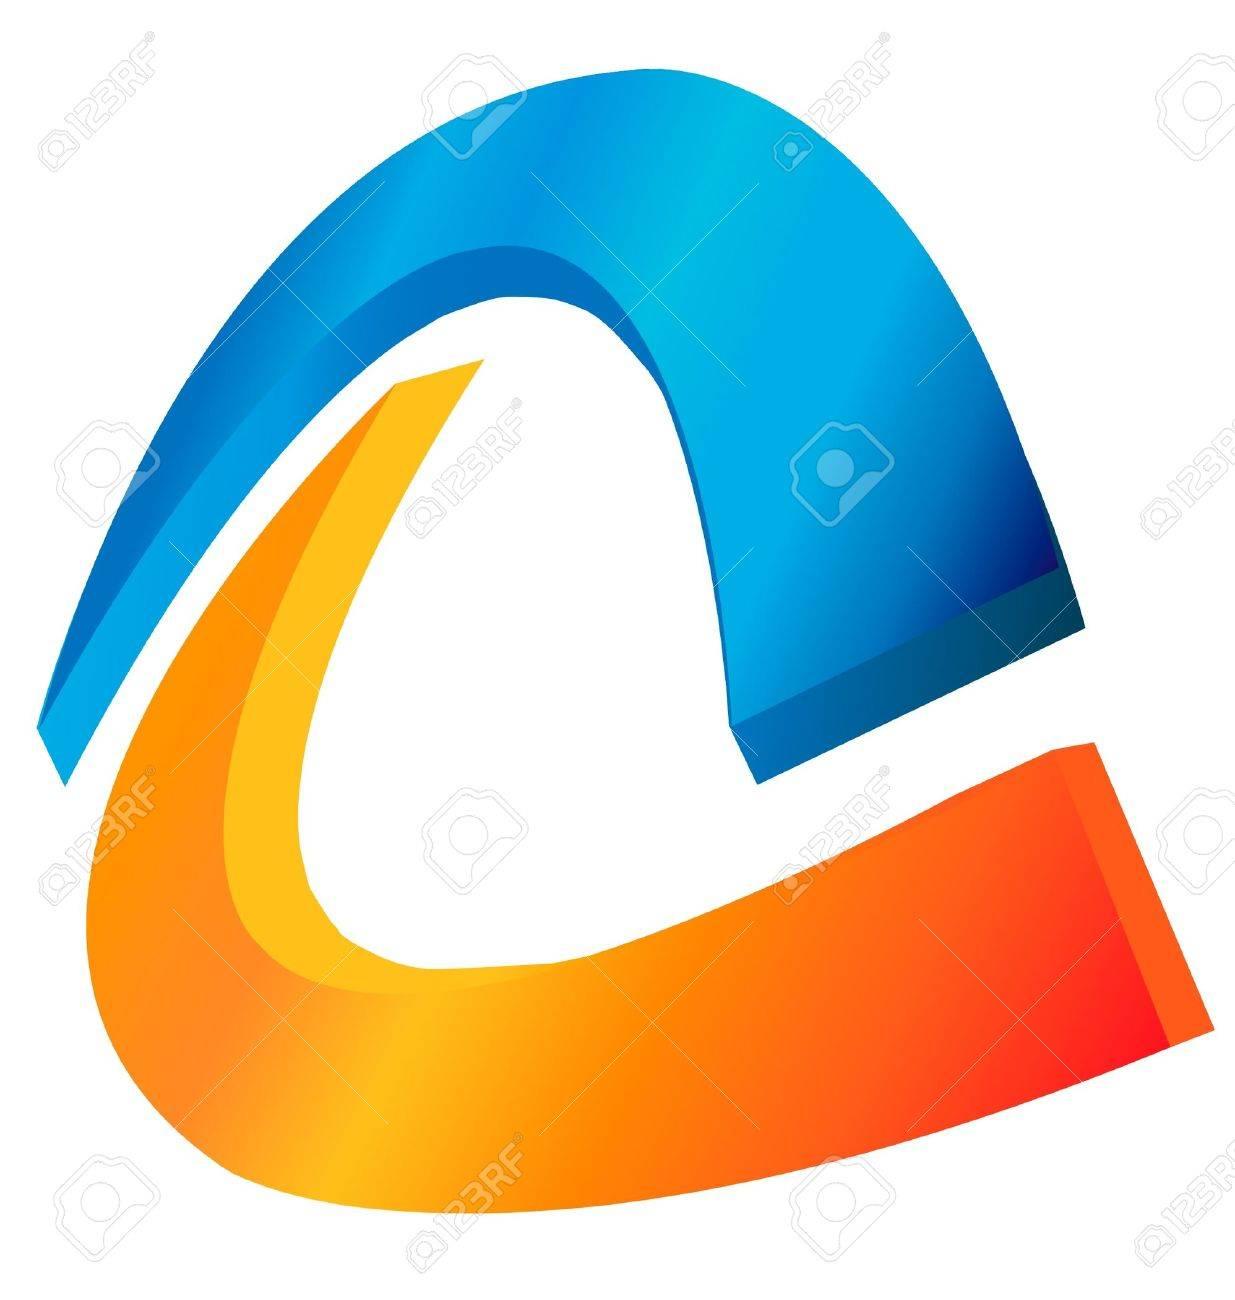 Abstract logo - 13975524